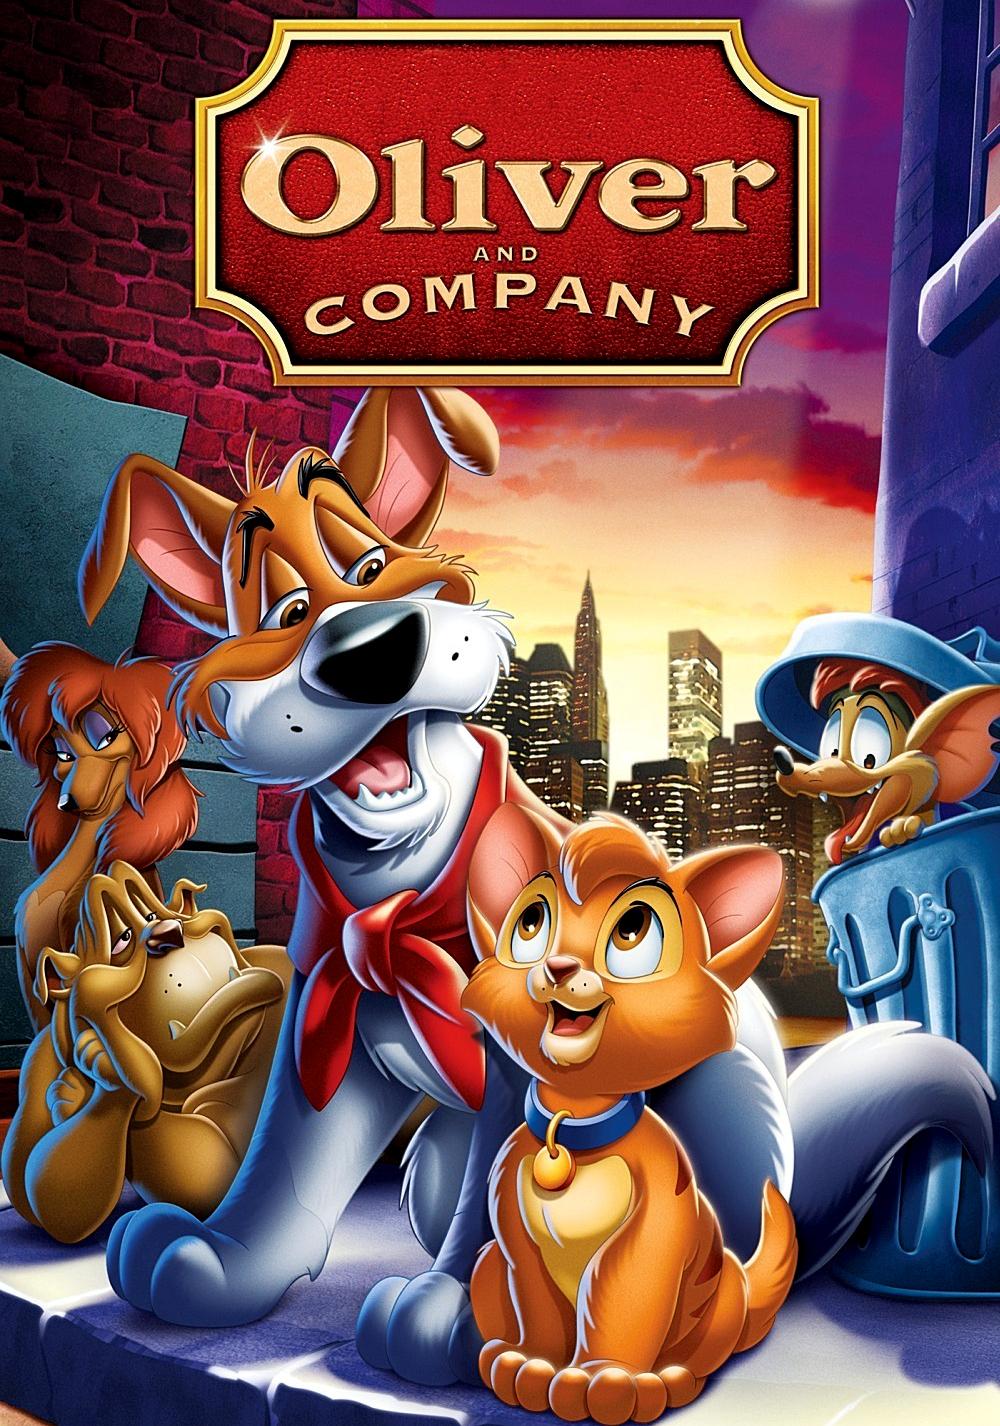 Oliver & Company credits